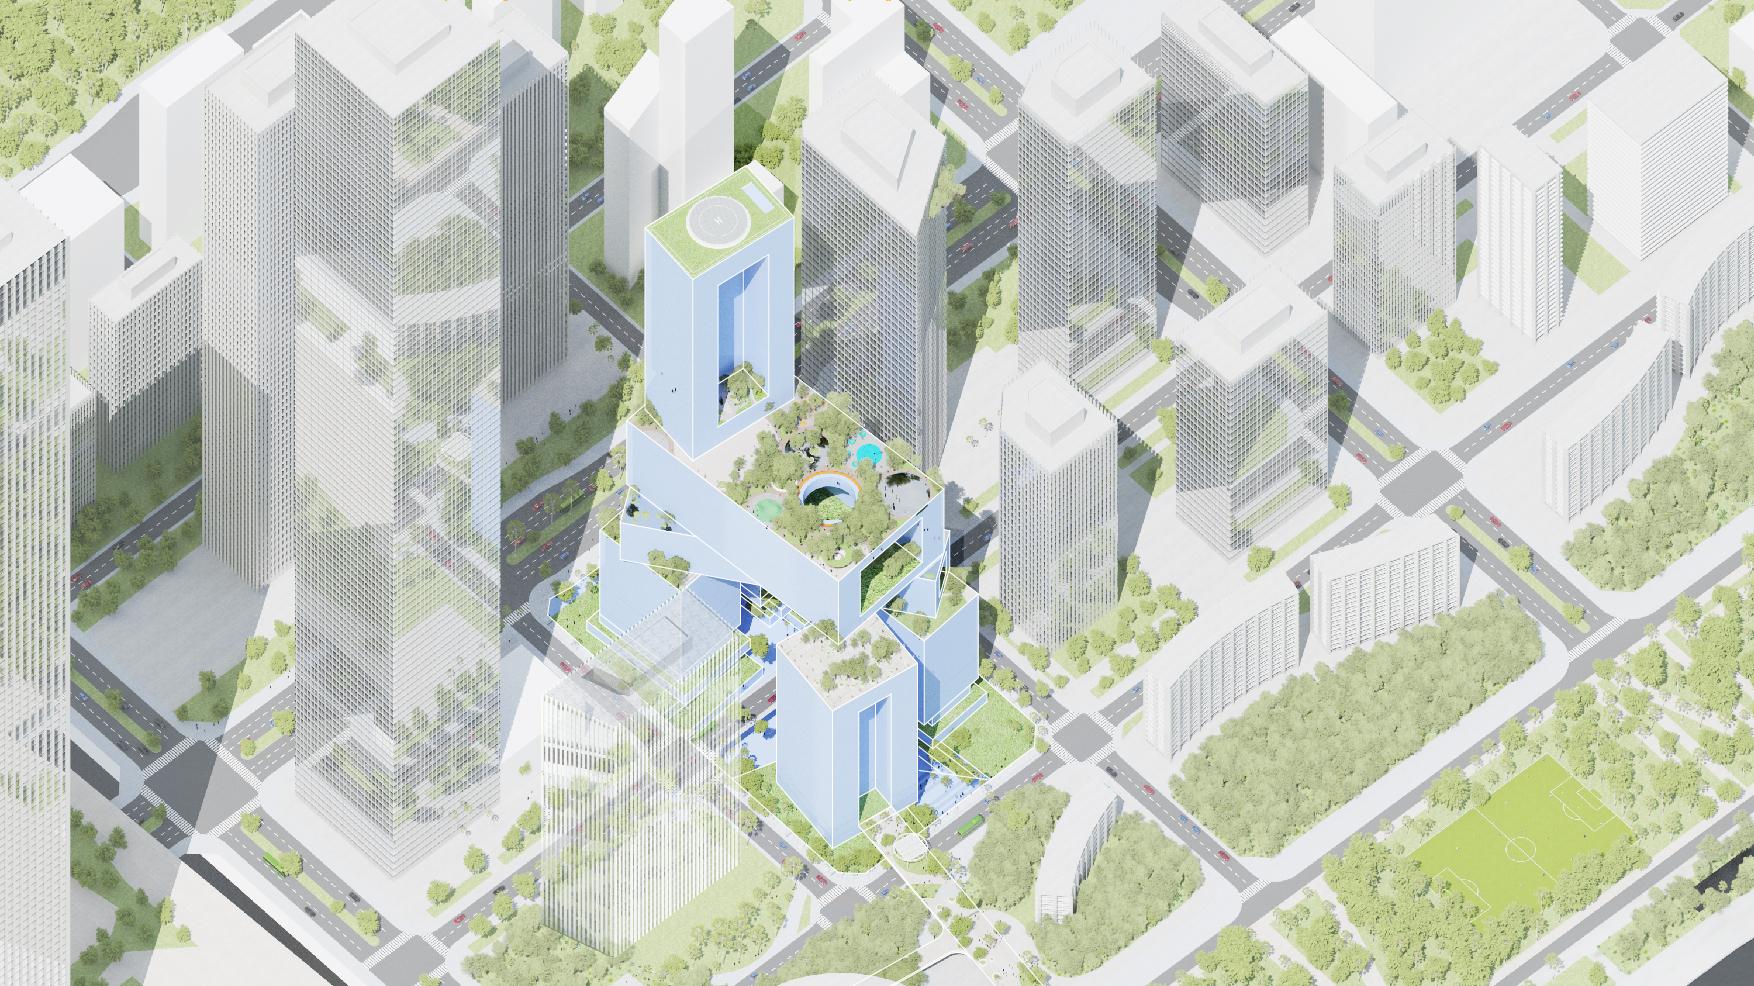 <p>Hoogbouw Vanke 3D City door MVRDV in Shenzhen (China)</p>